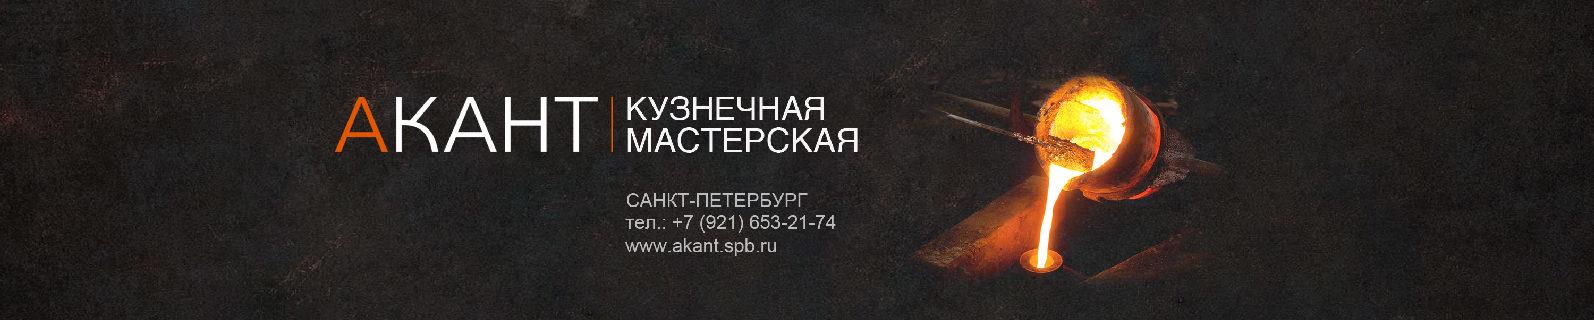 "Кузнечная мастерская ""Акант"""